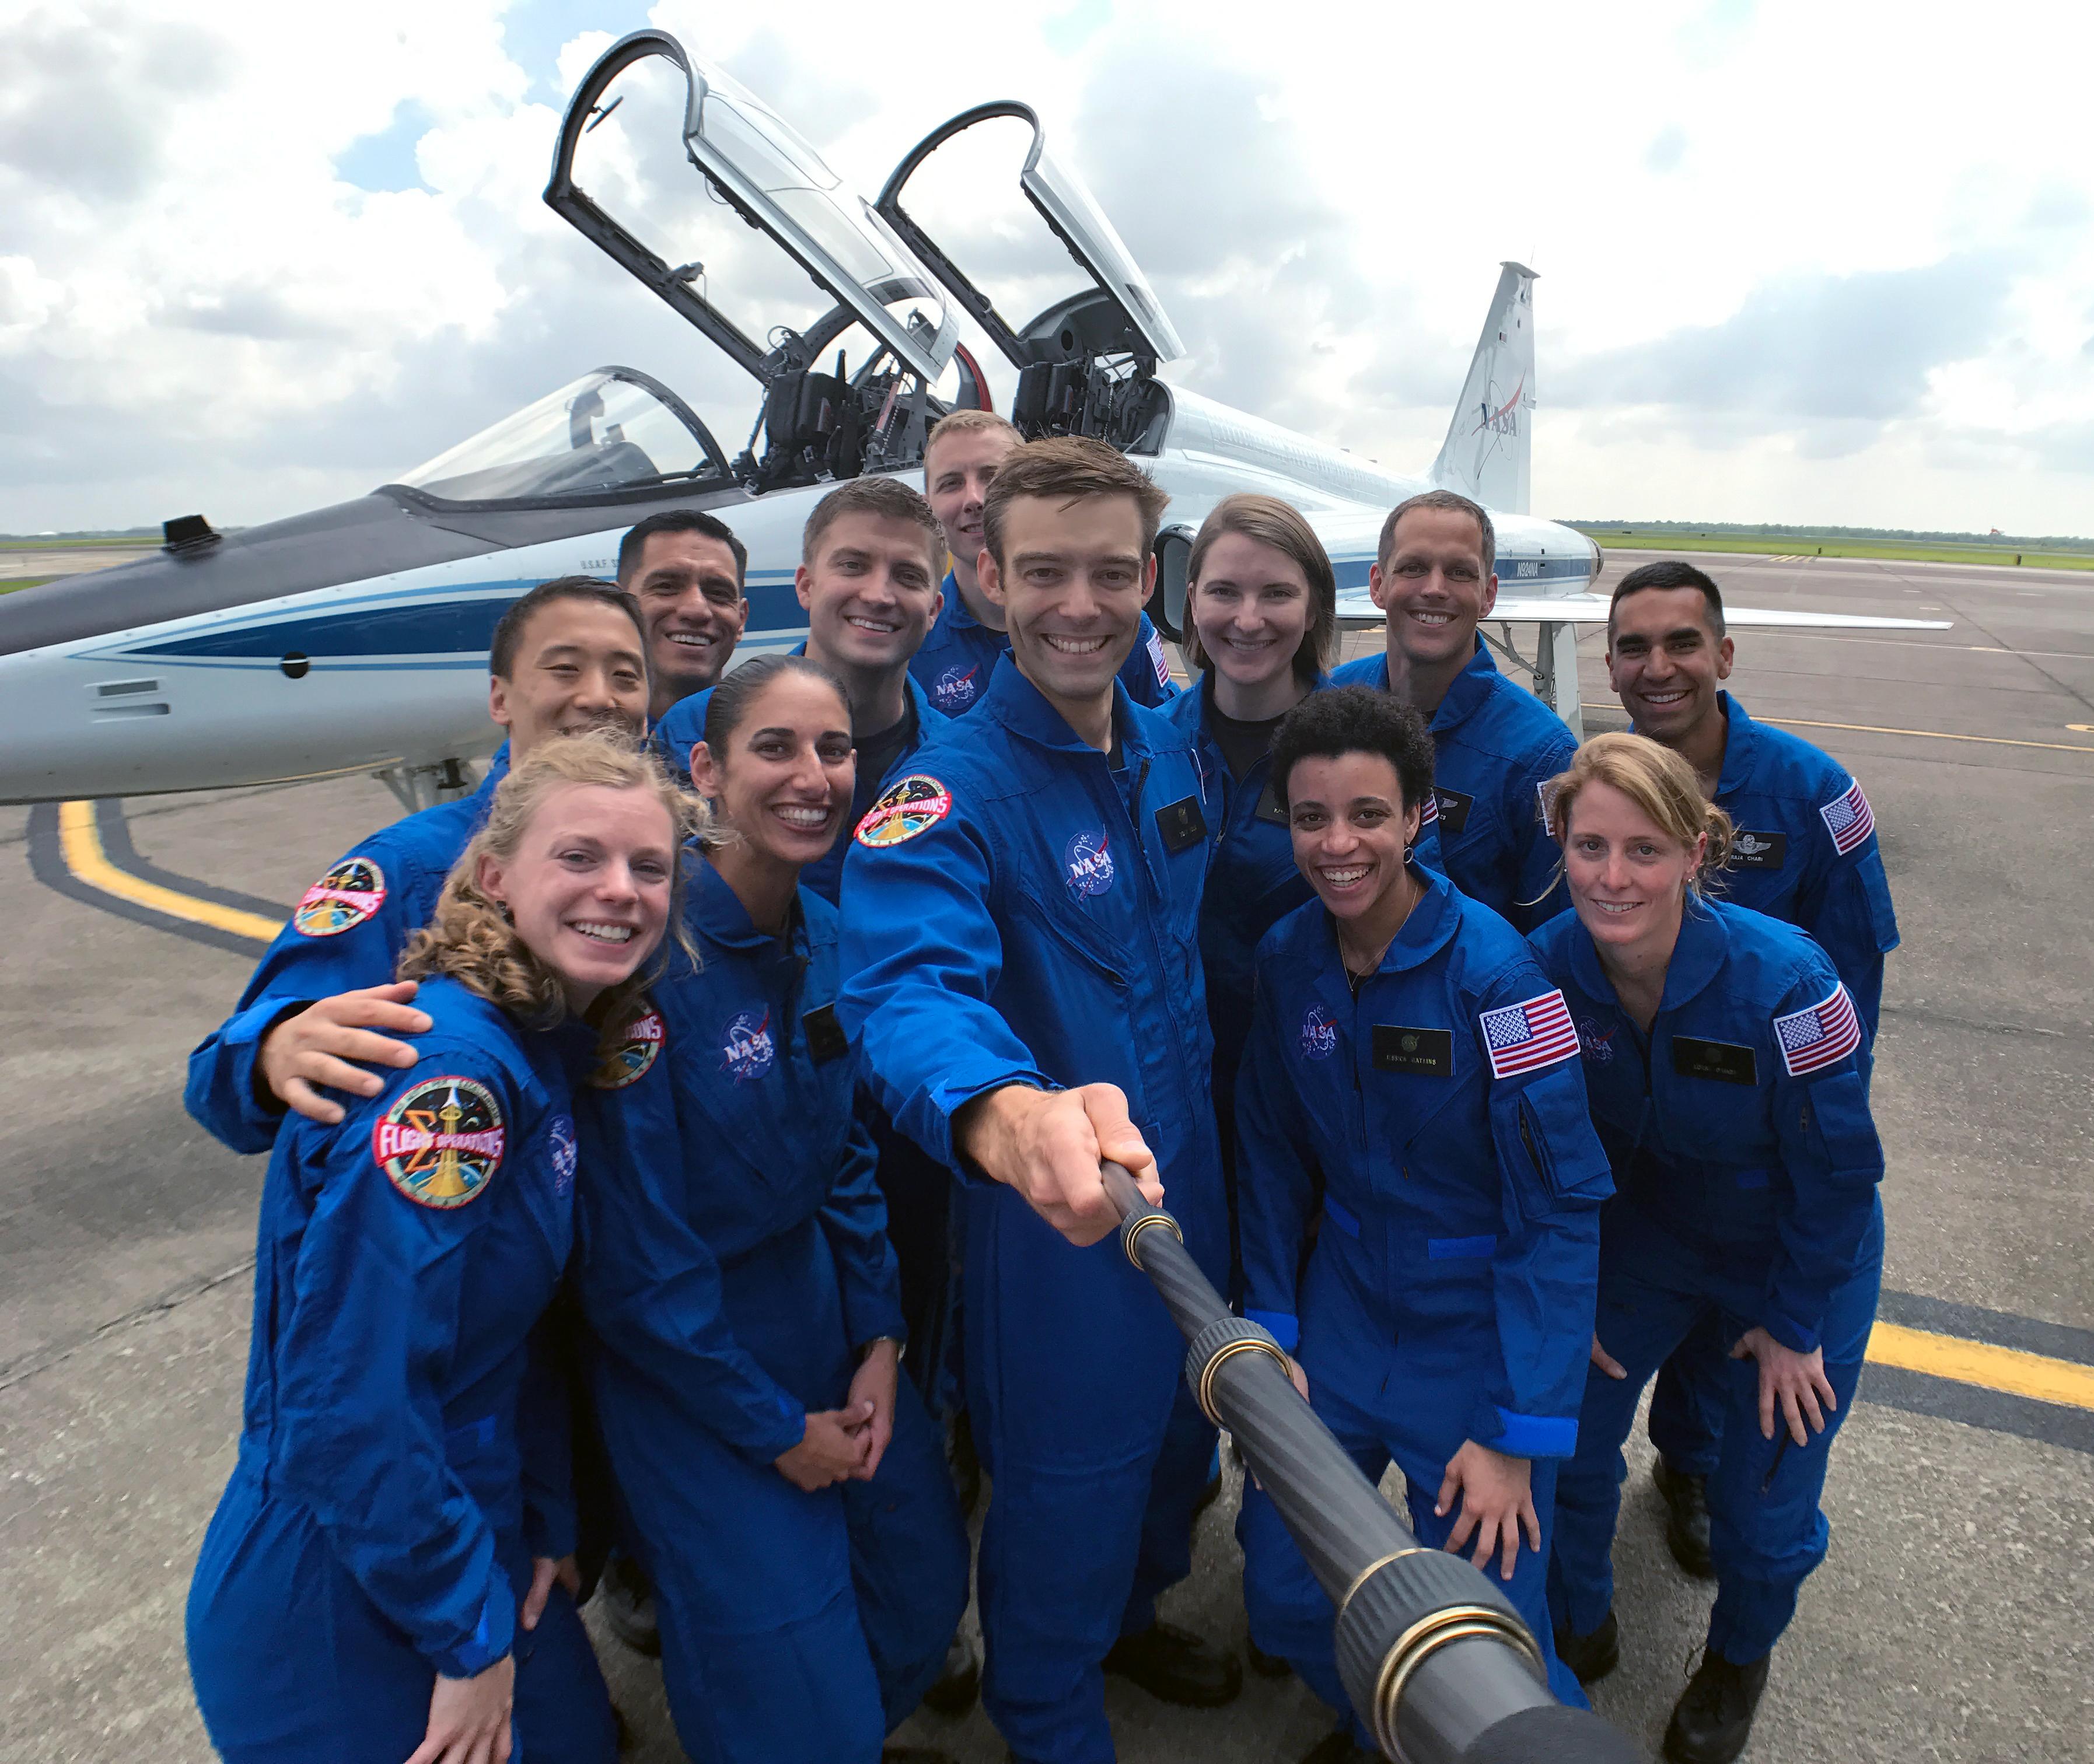 2017 Astronaut Candidates